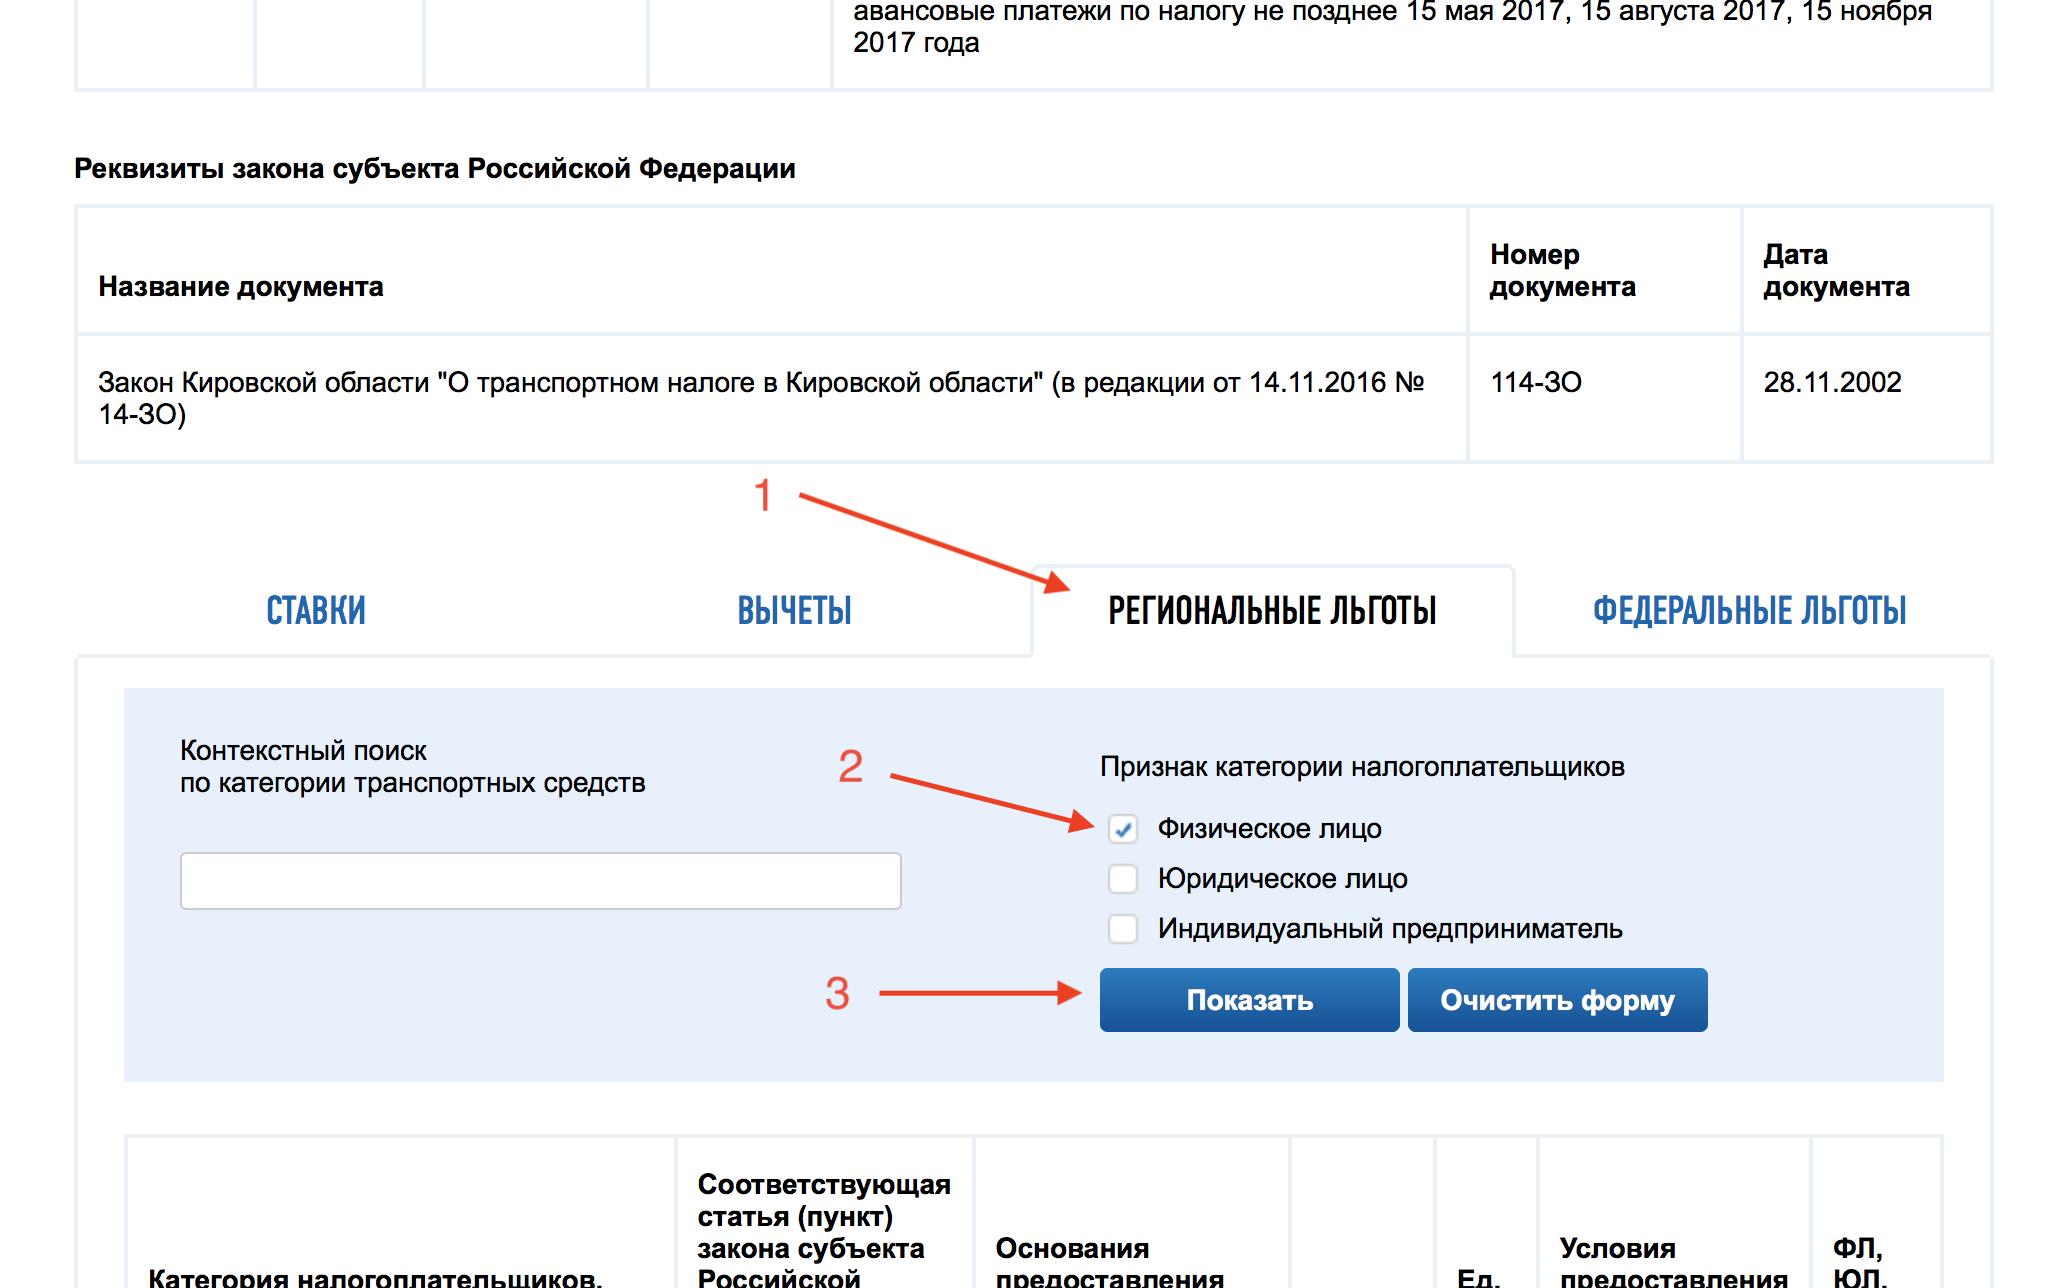 Налог.ру - заполнение транспортного налога